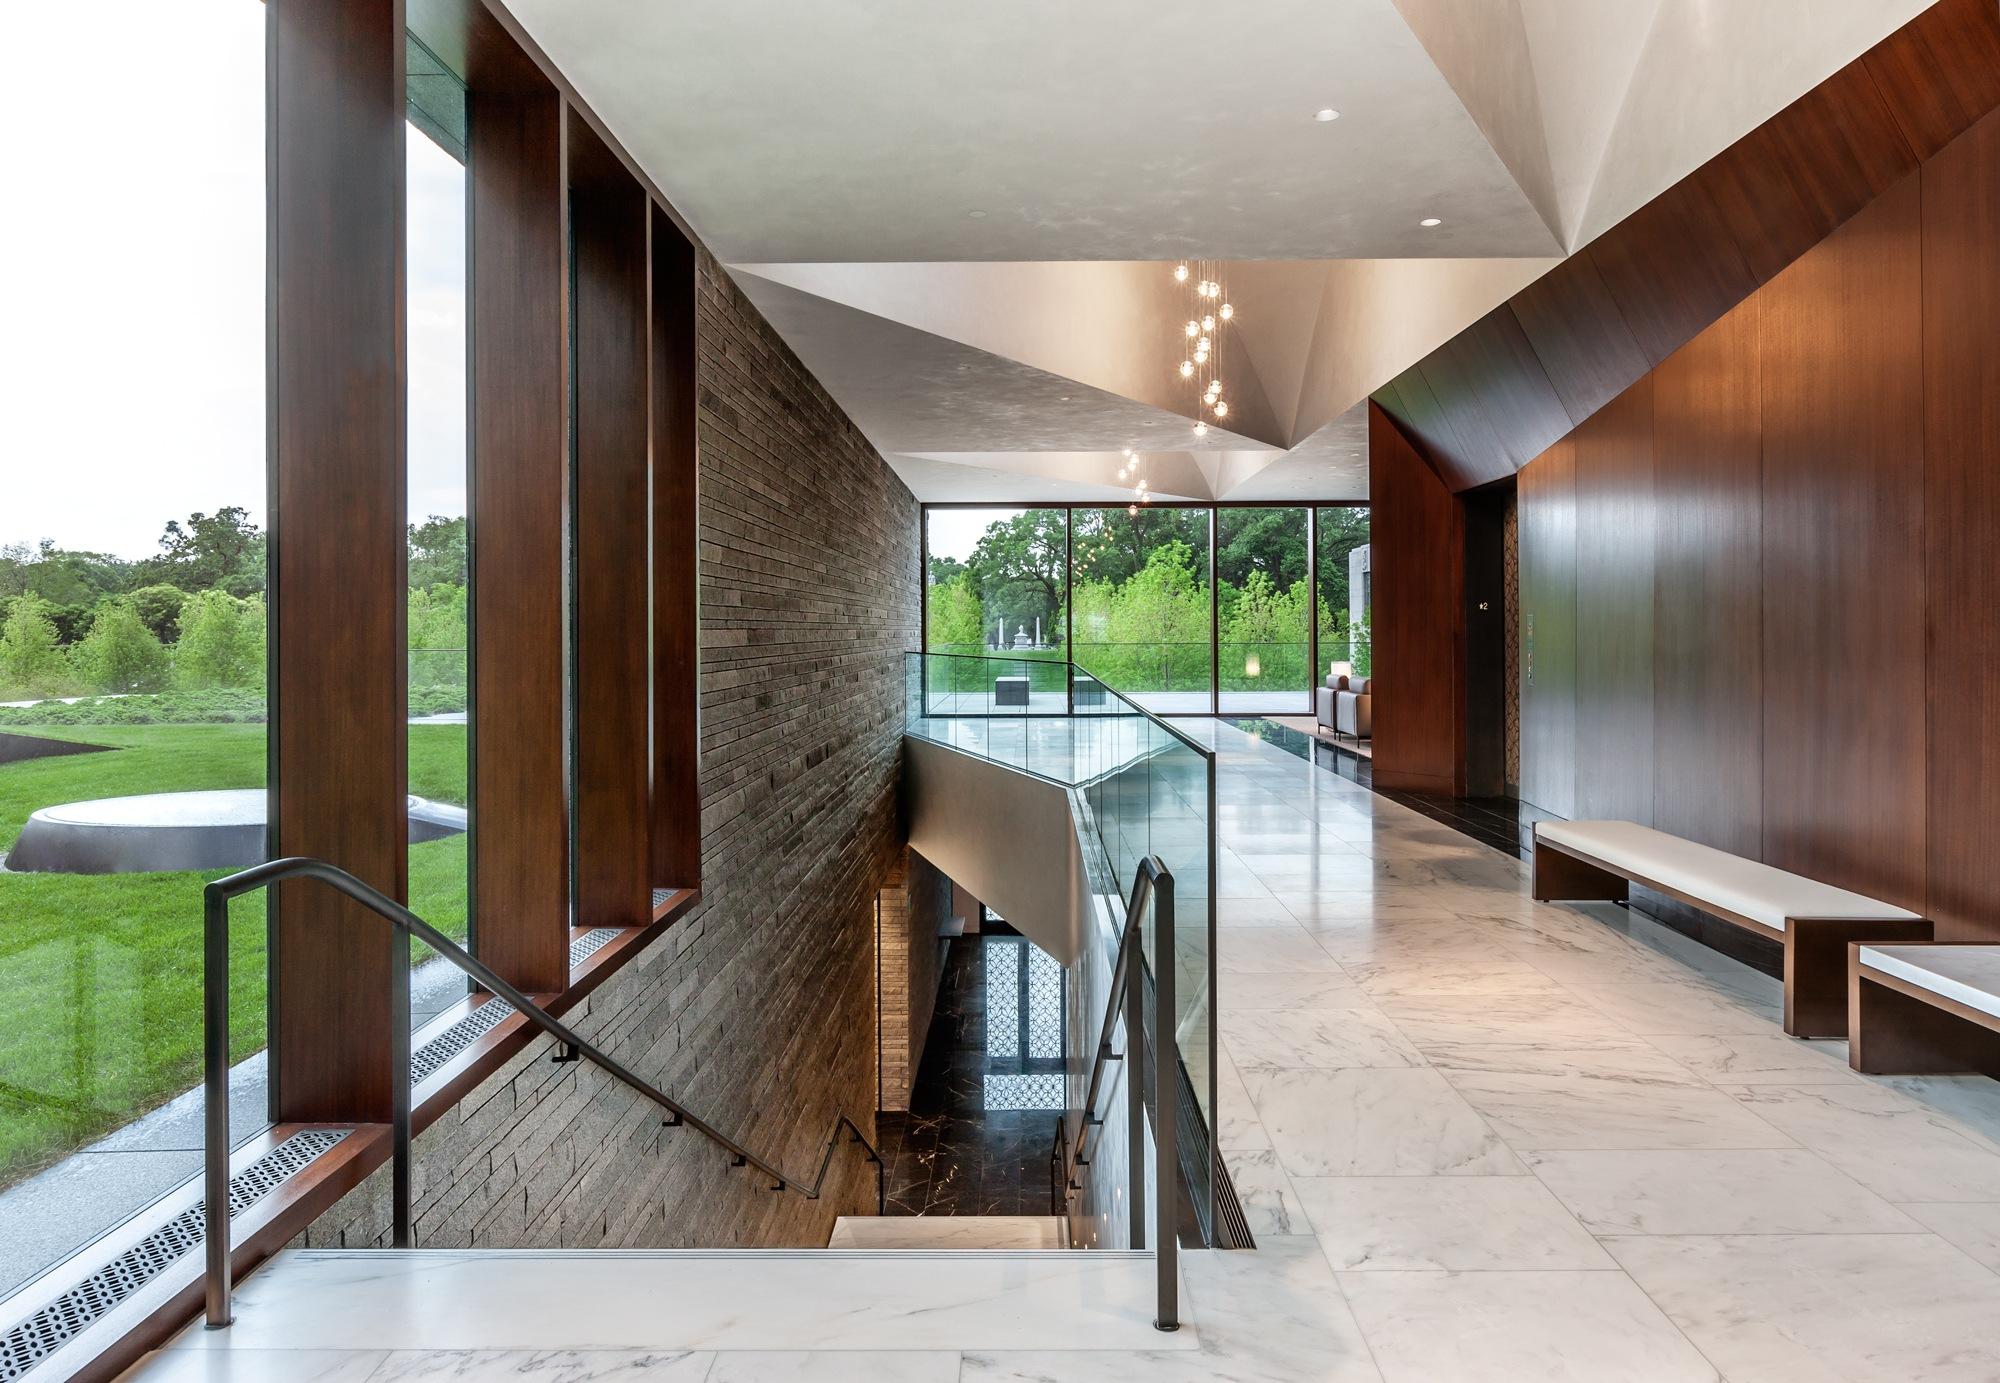 Top 100 Interior Design Firms 2017